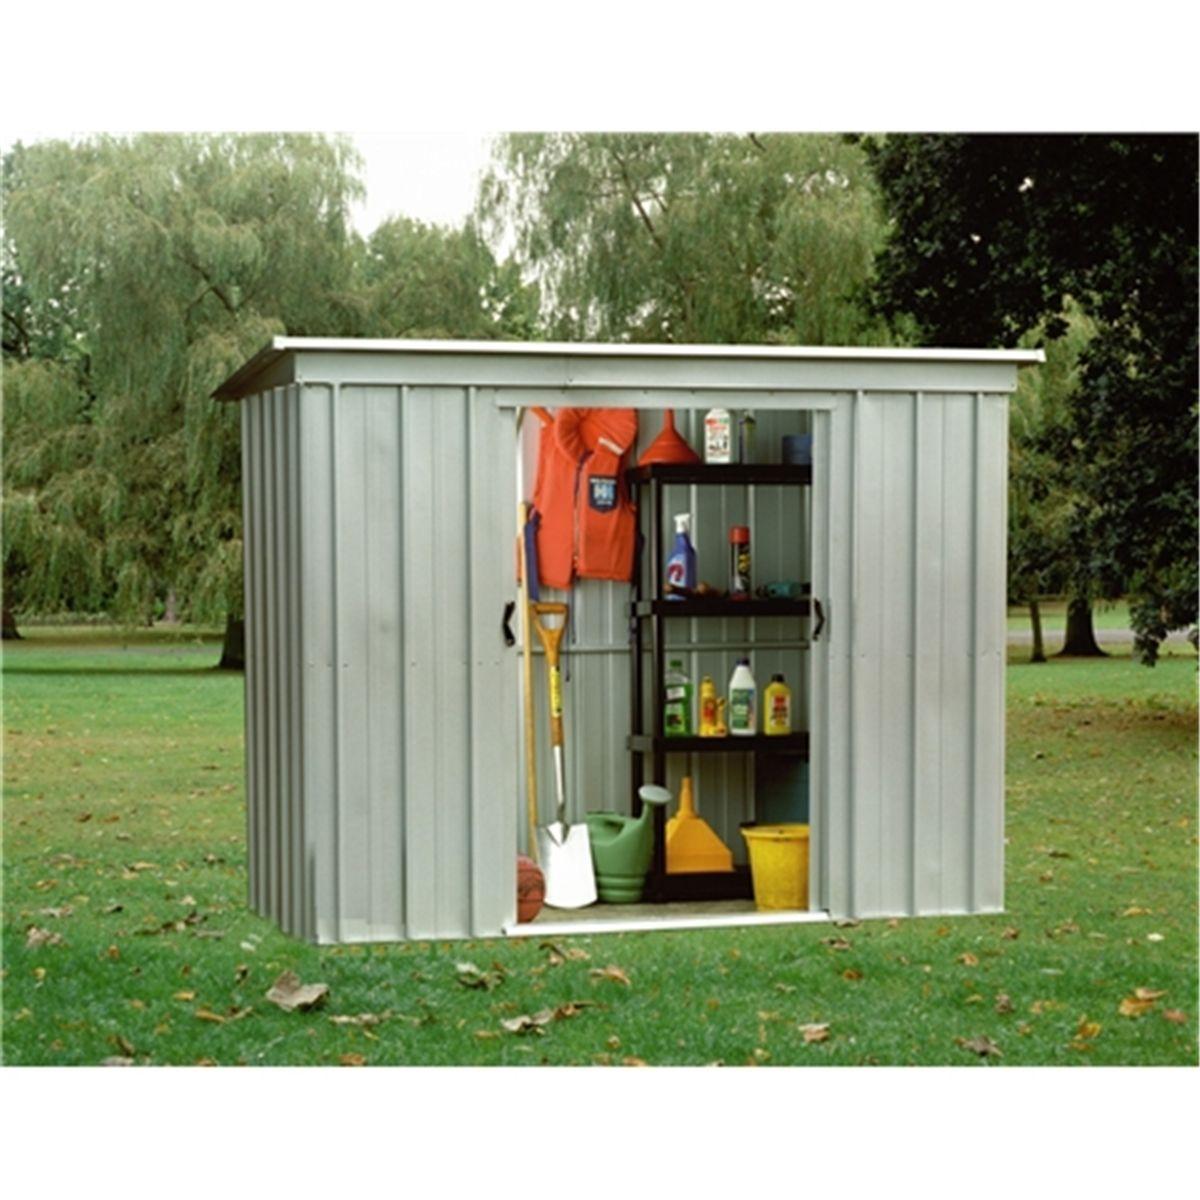 the 25 best metal shed ideas on pinterest metal sheds uk craftsman sheds and craftsman backyard play - Garden Sheds Gumtree